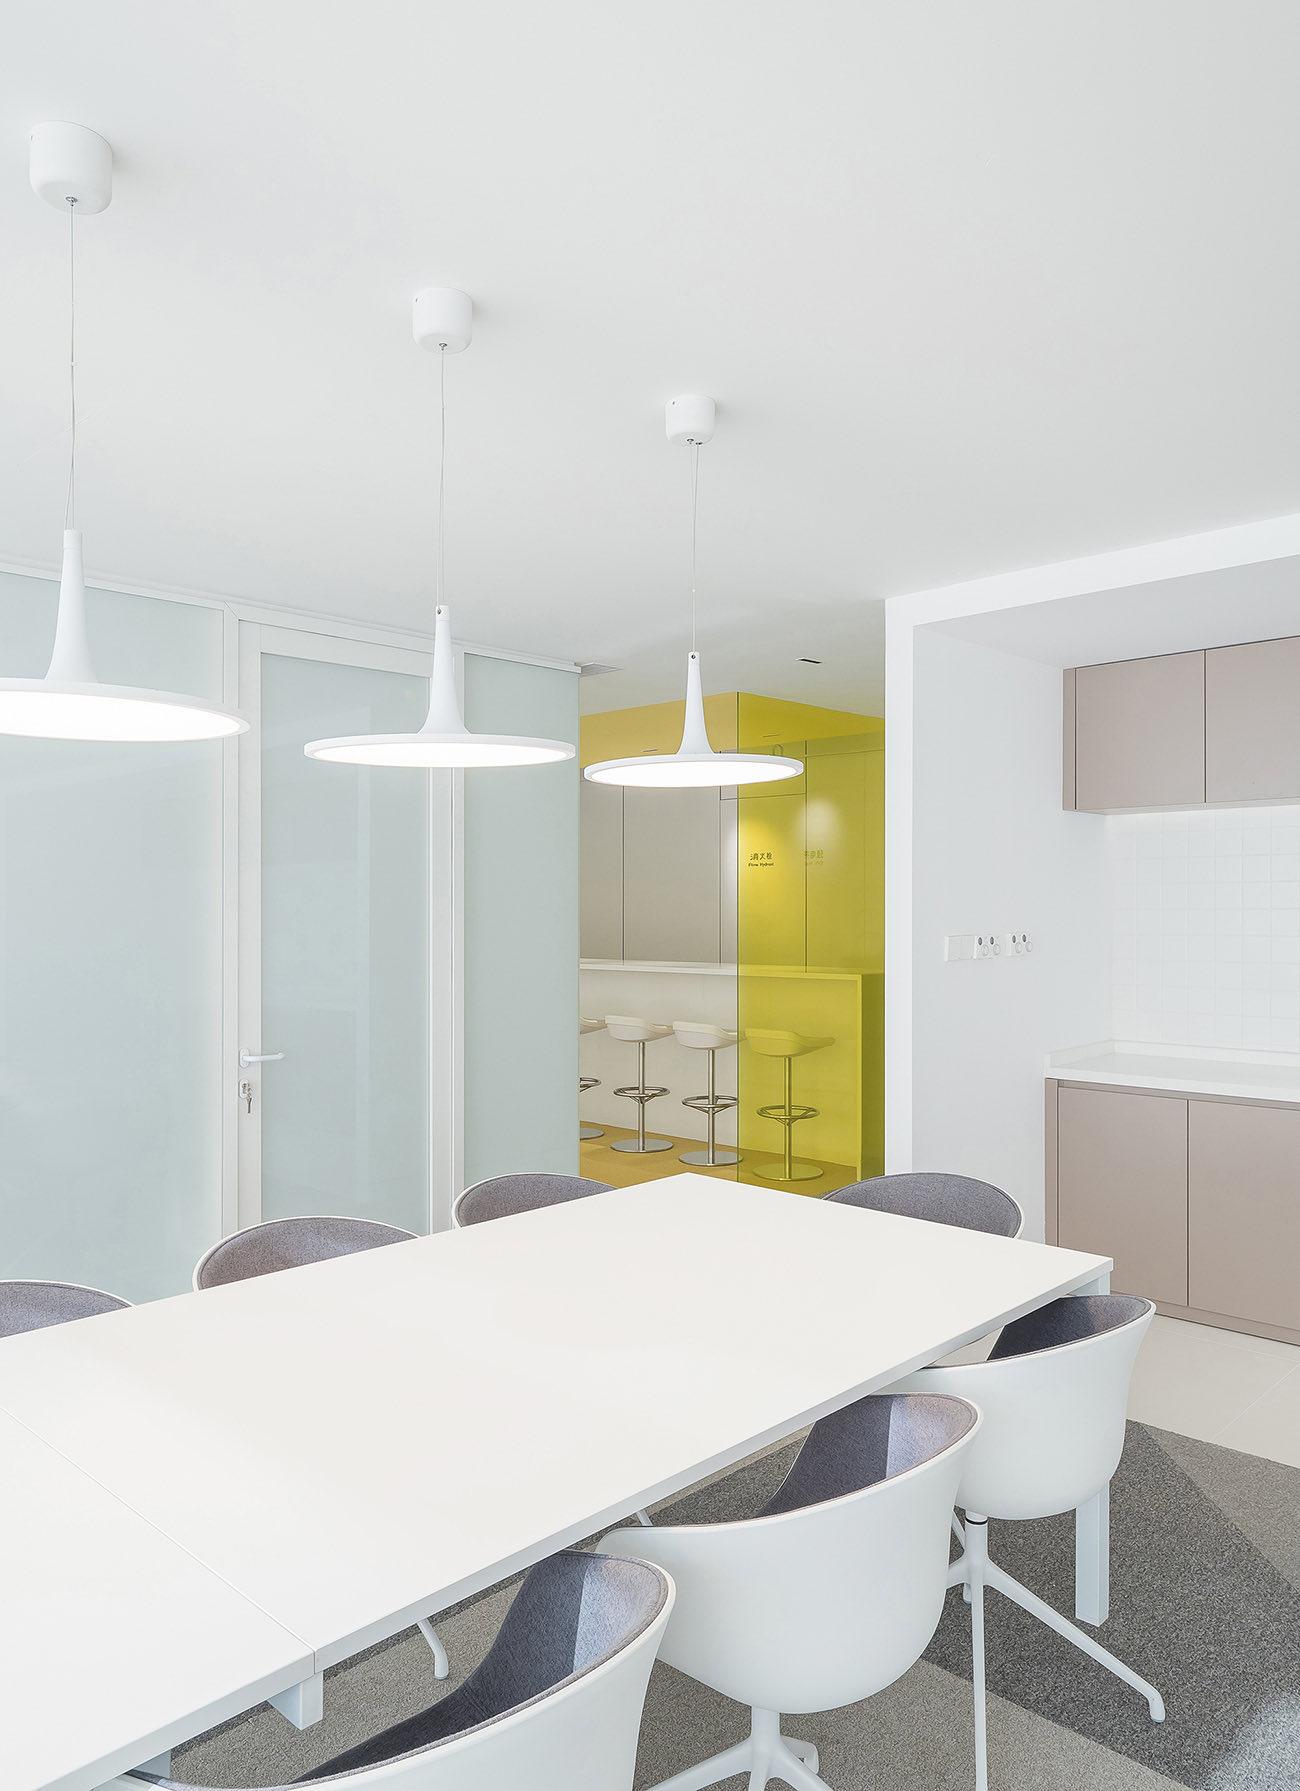 A Tour Of ViaBTC's Minimalist Shenzen Headquarters